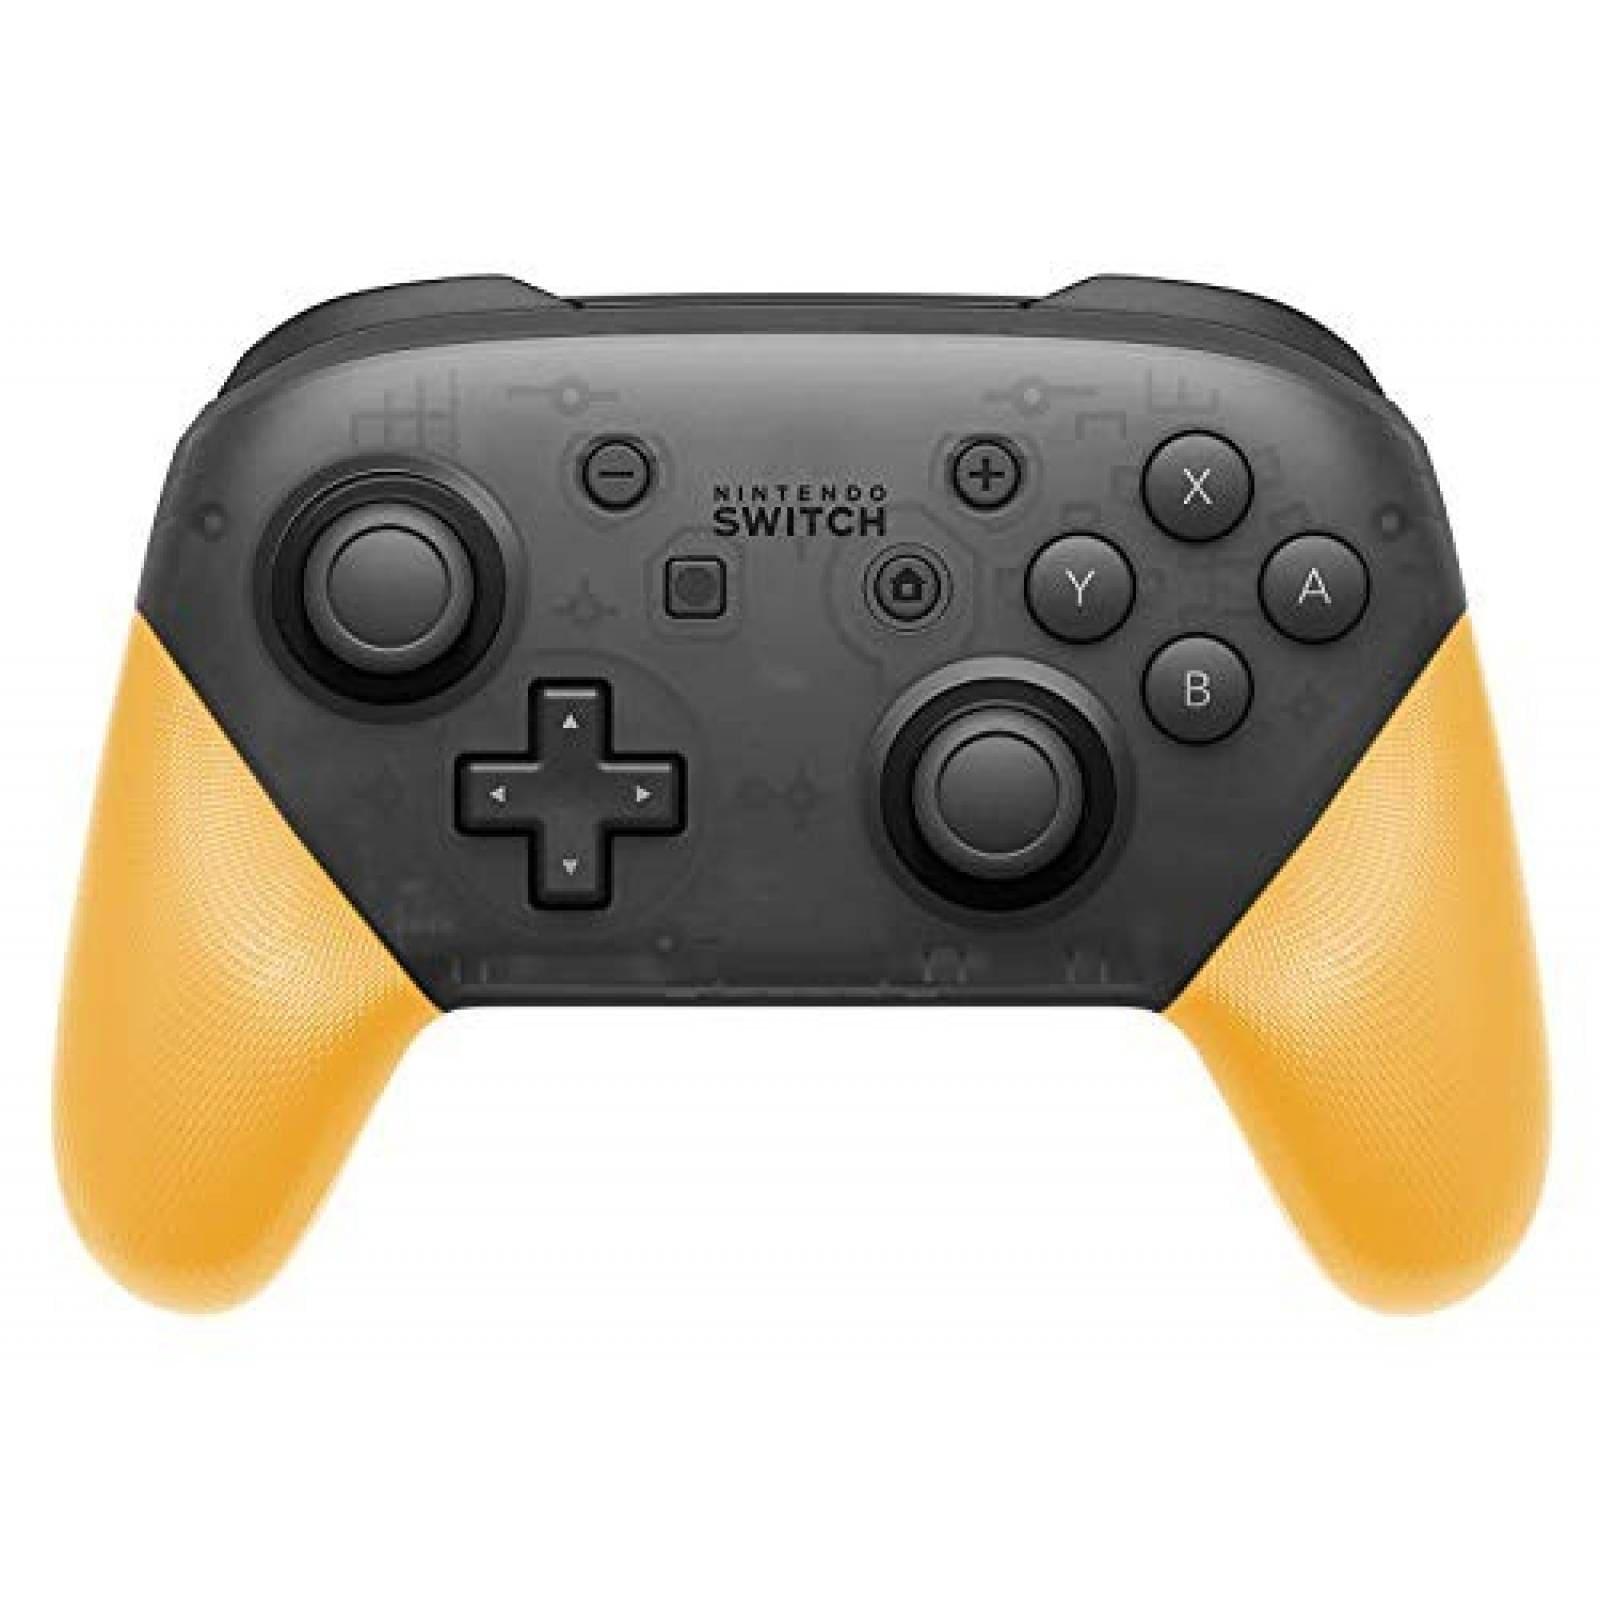 Grips de reemplazo FYOUNG para Nintendo Switch Pro -Amarillo